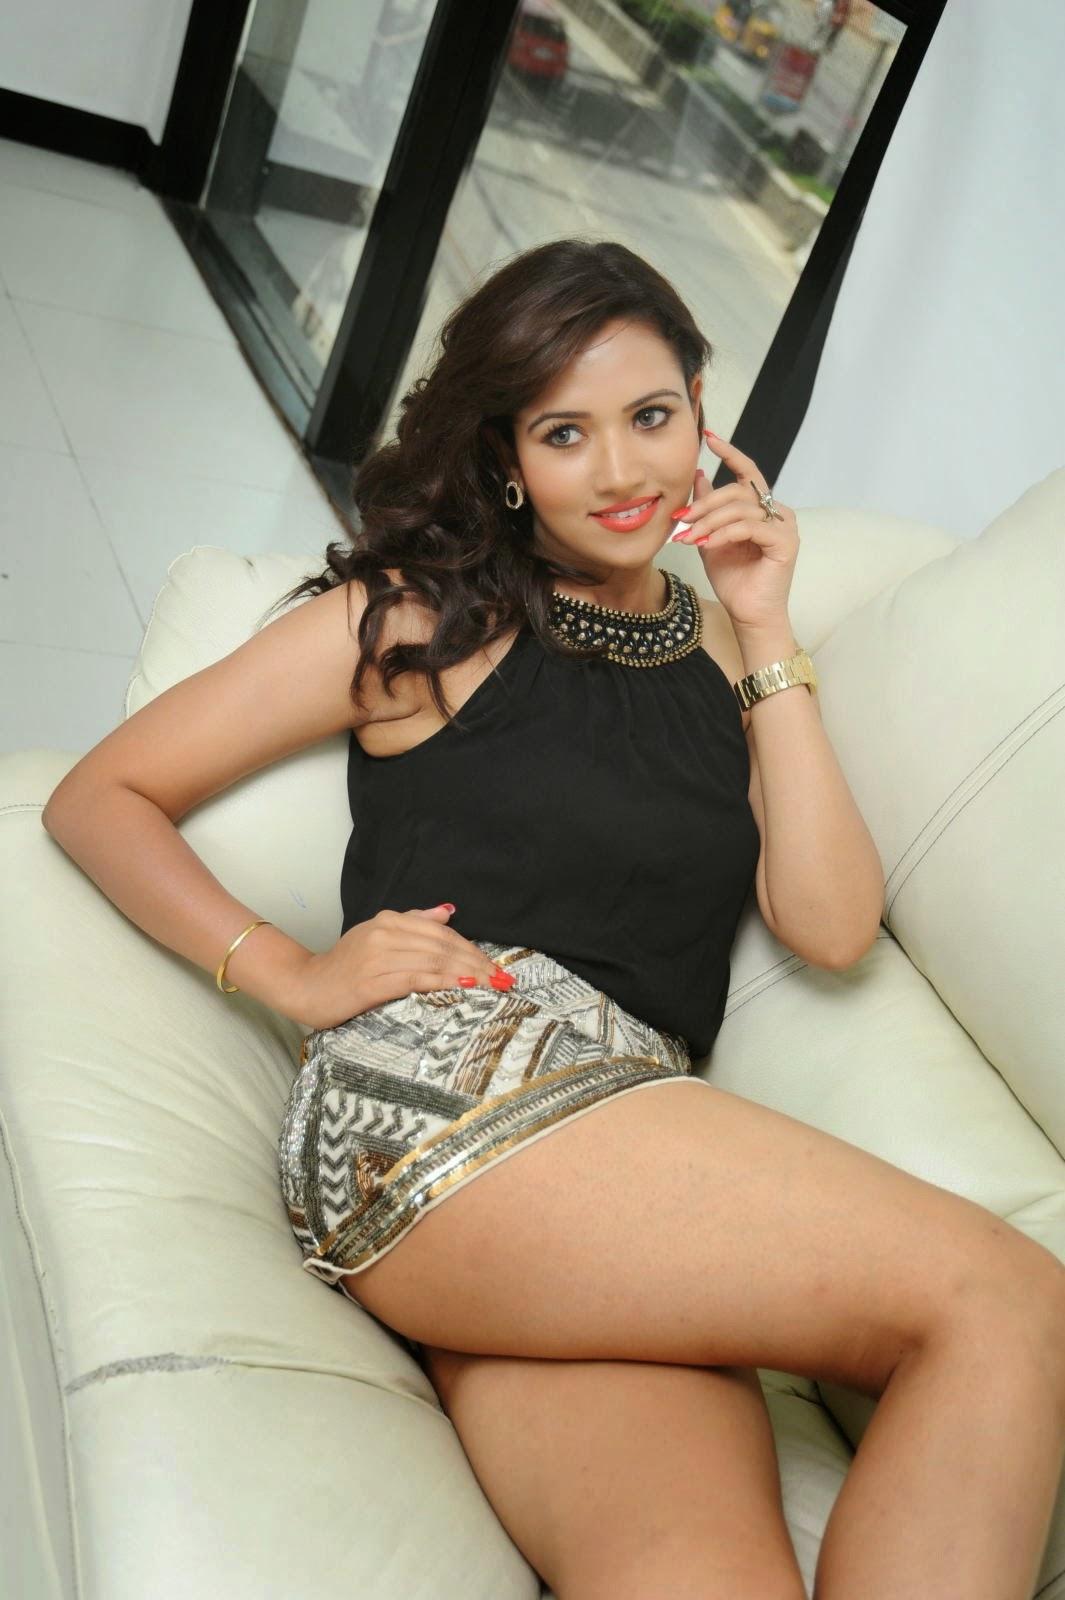 Really. agree Paki sexy porns girls shoots agree